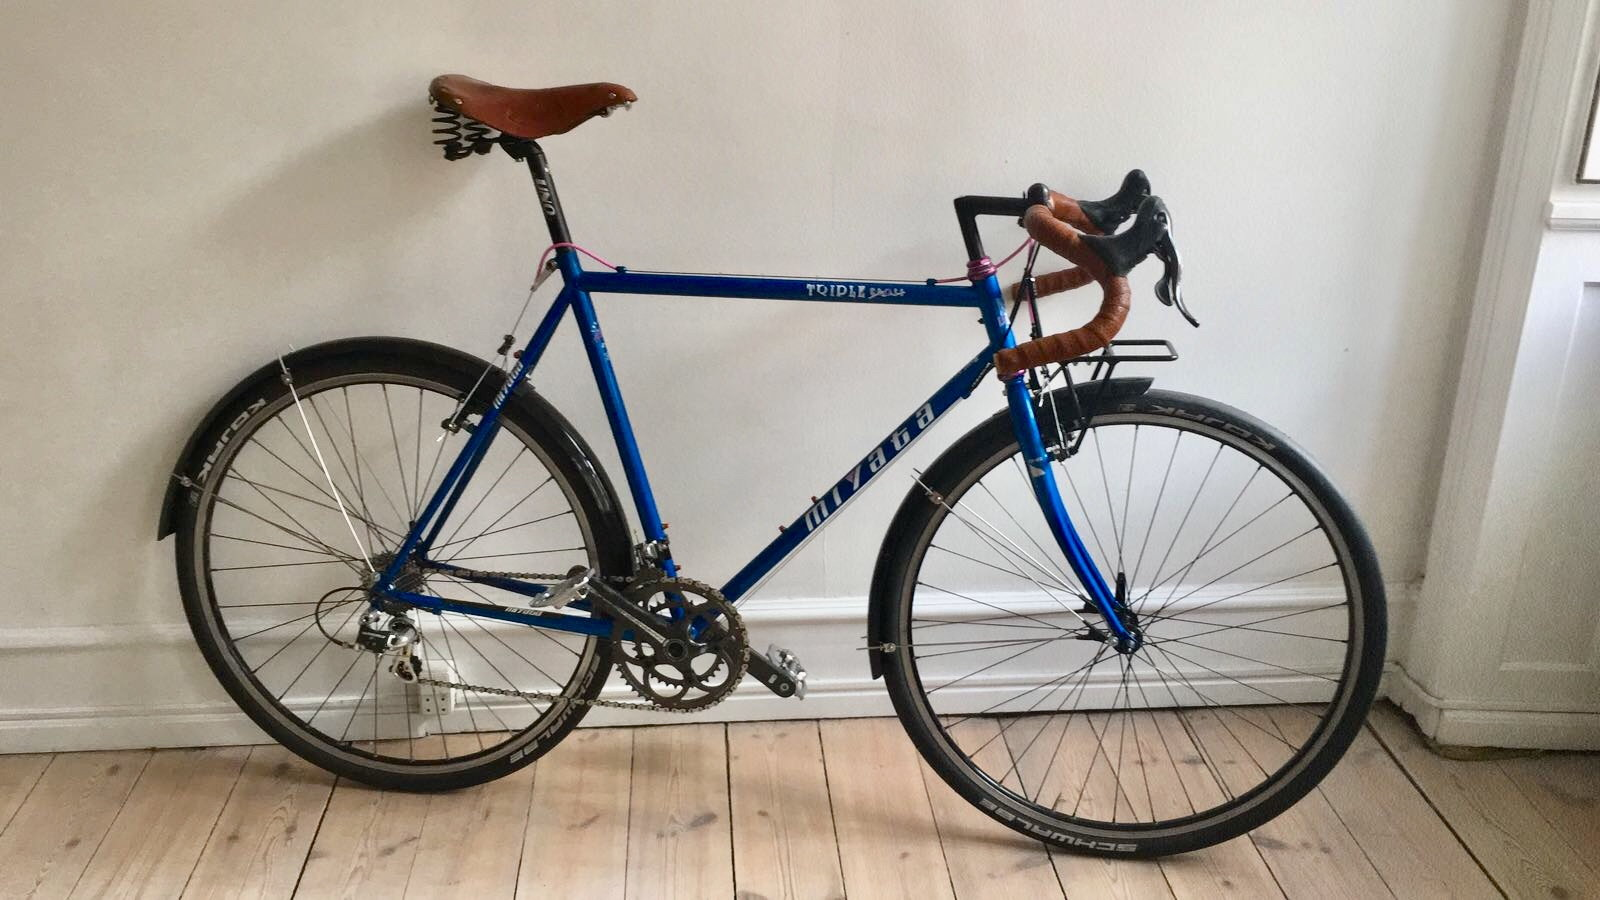 1992 Miyata Triple Cross Bike Forums